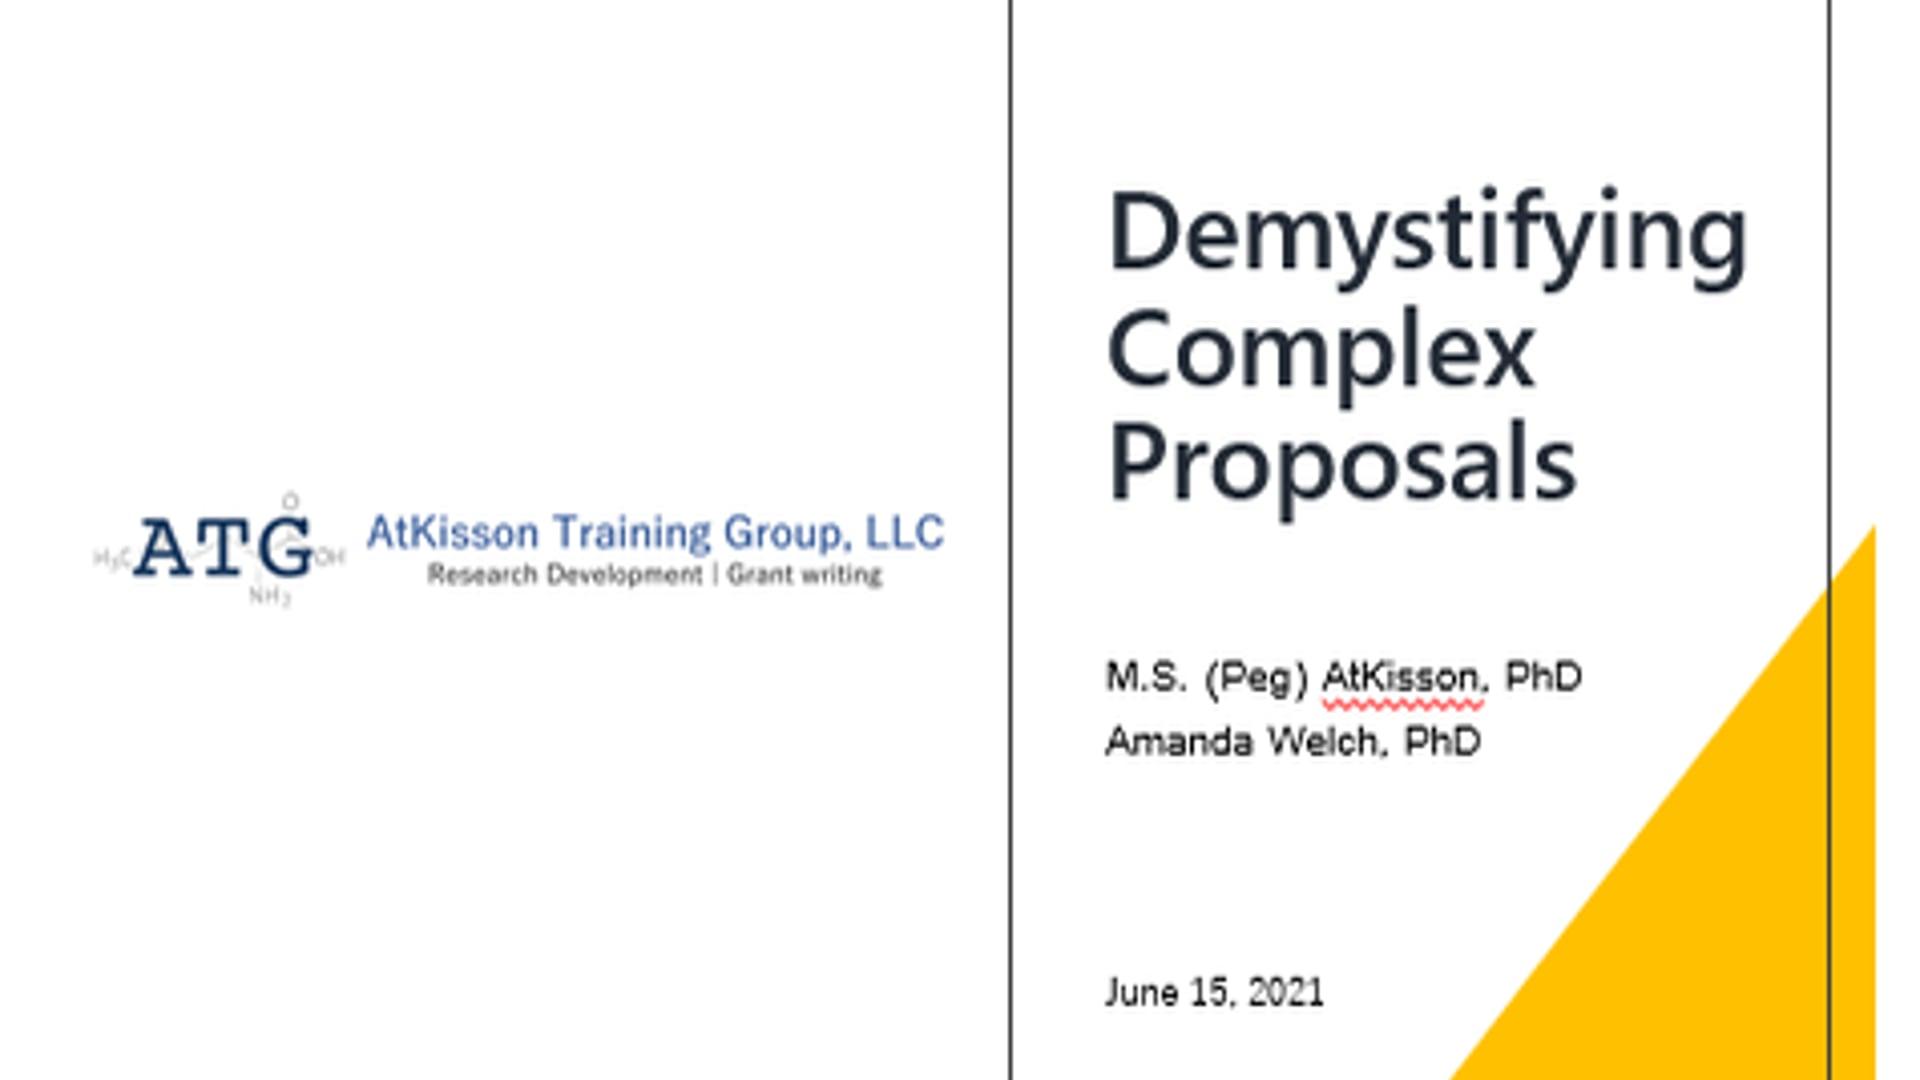 Demystifying Complex Proposals